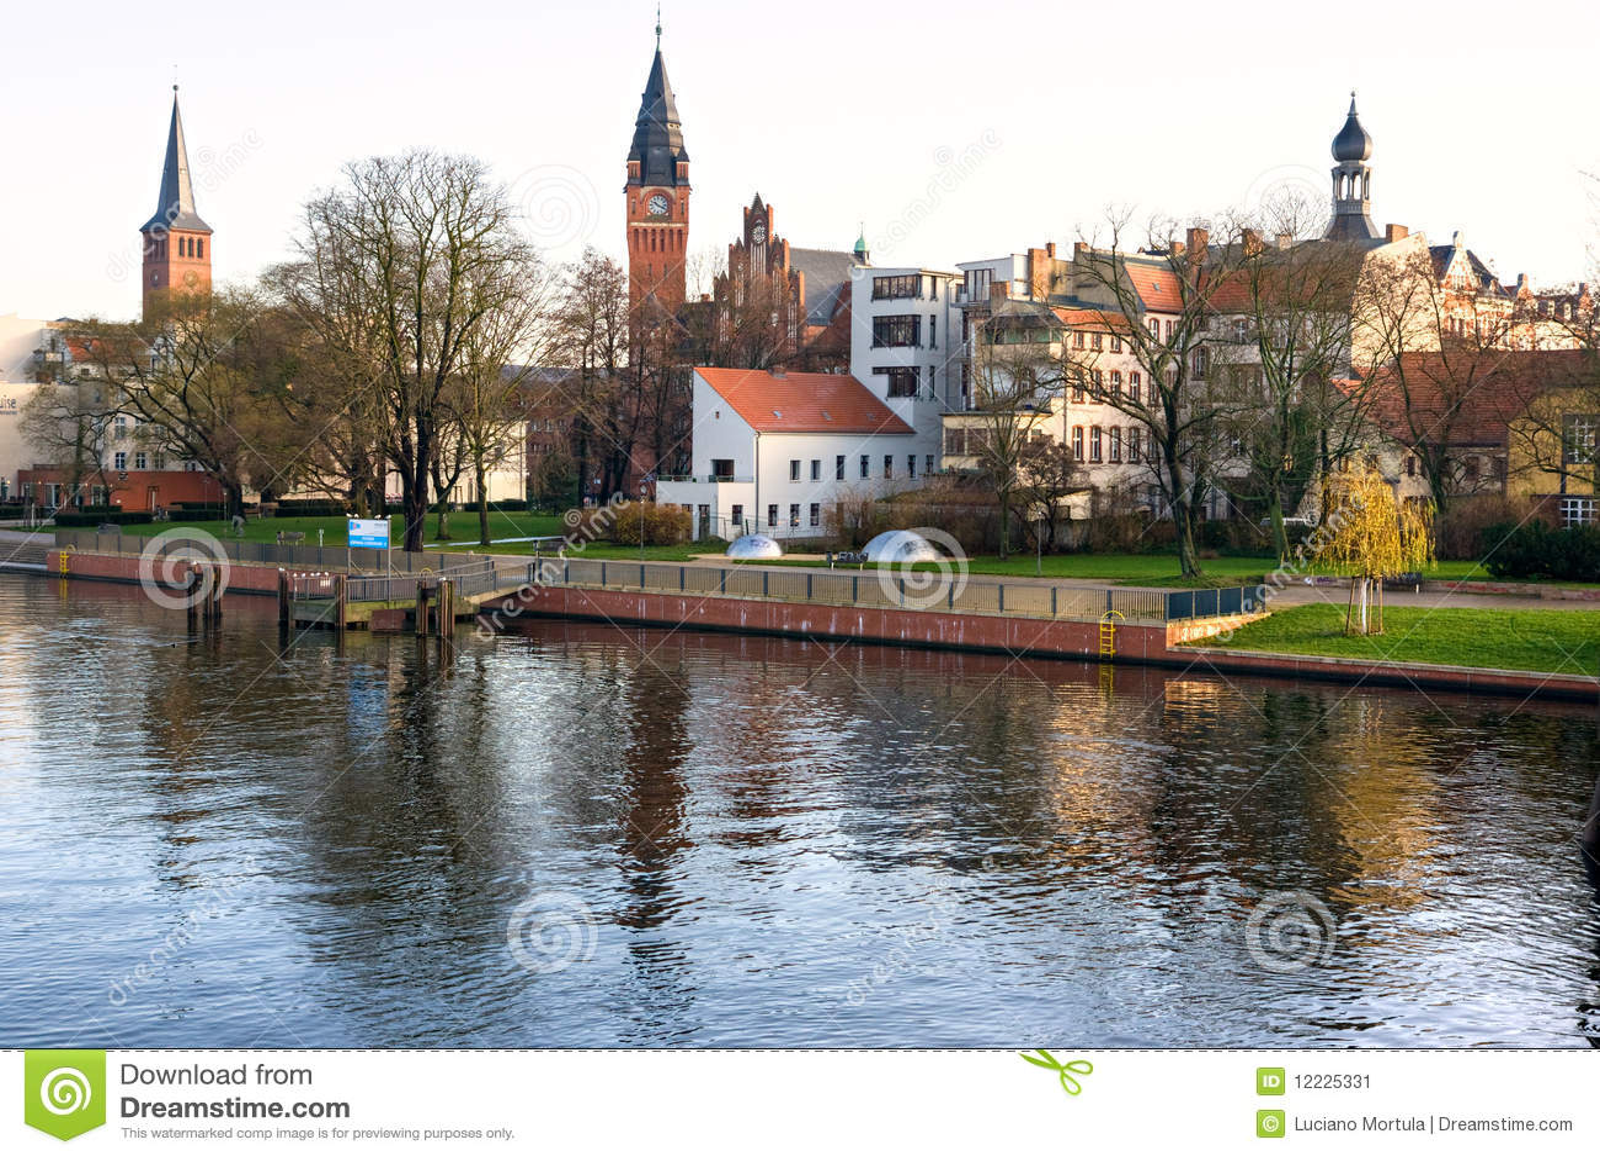 Kopenick, Berlin, Germany. Stock Image - Image: 12225331